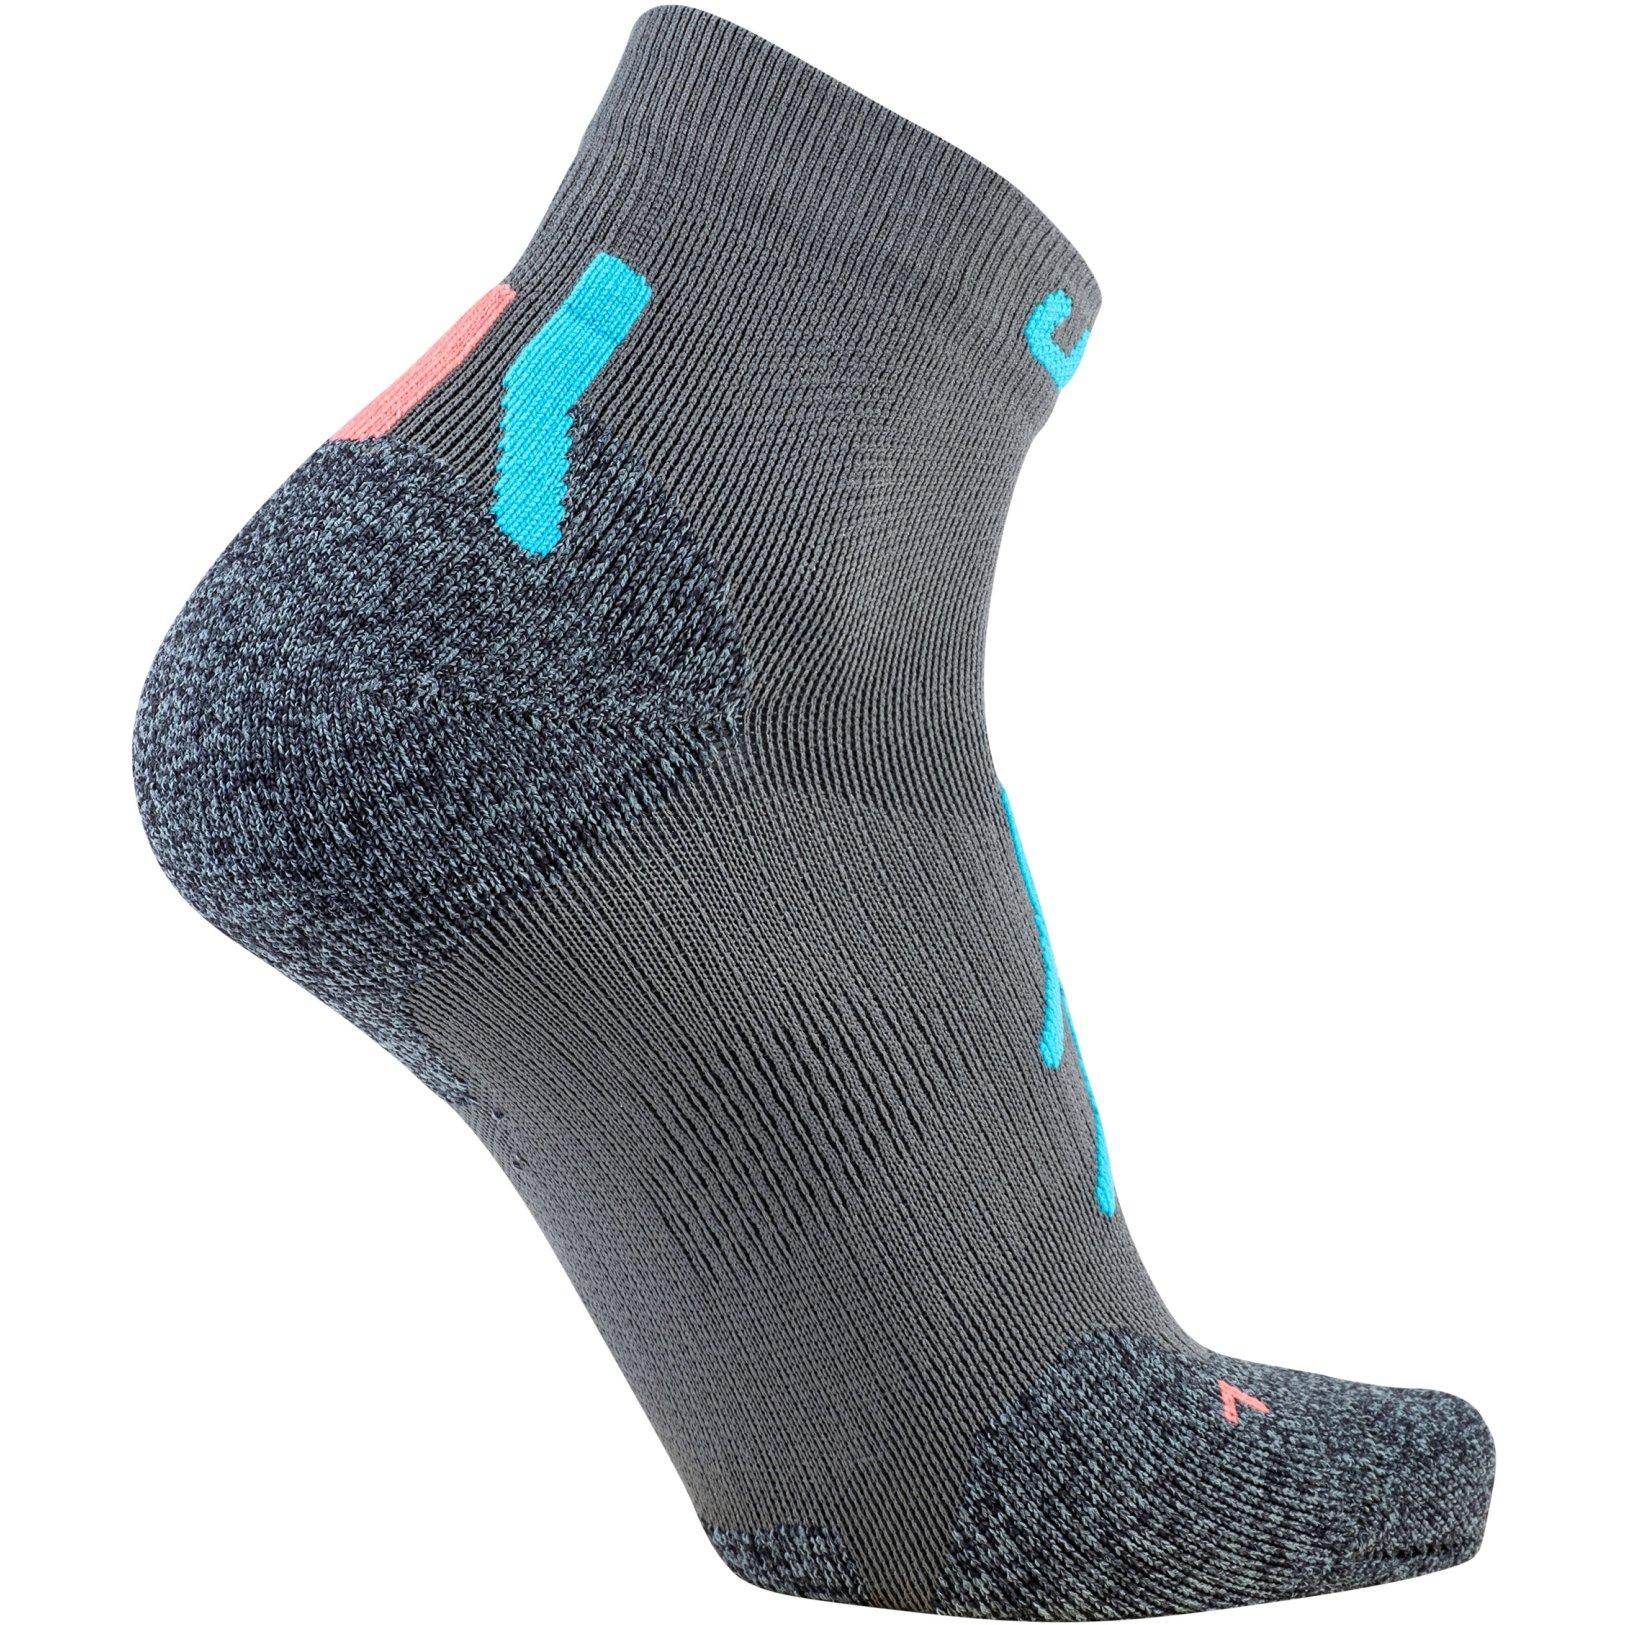 Image of UYN Lady Trekking Approach Low Cut Socks - Grey/Turquoise